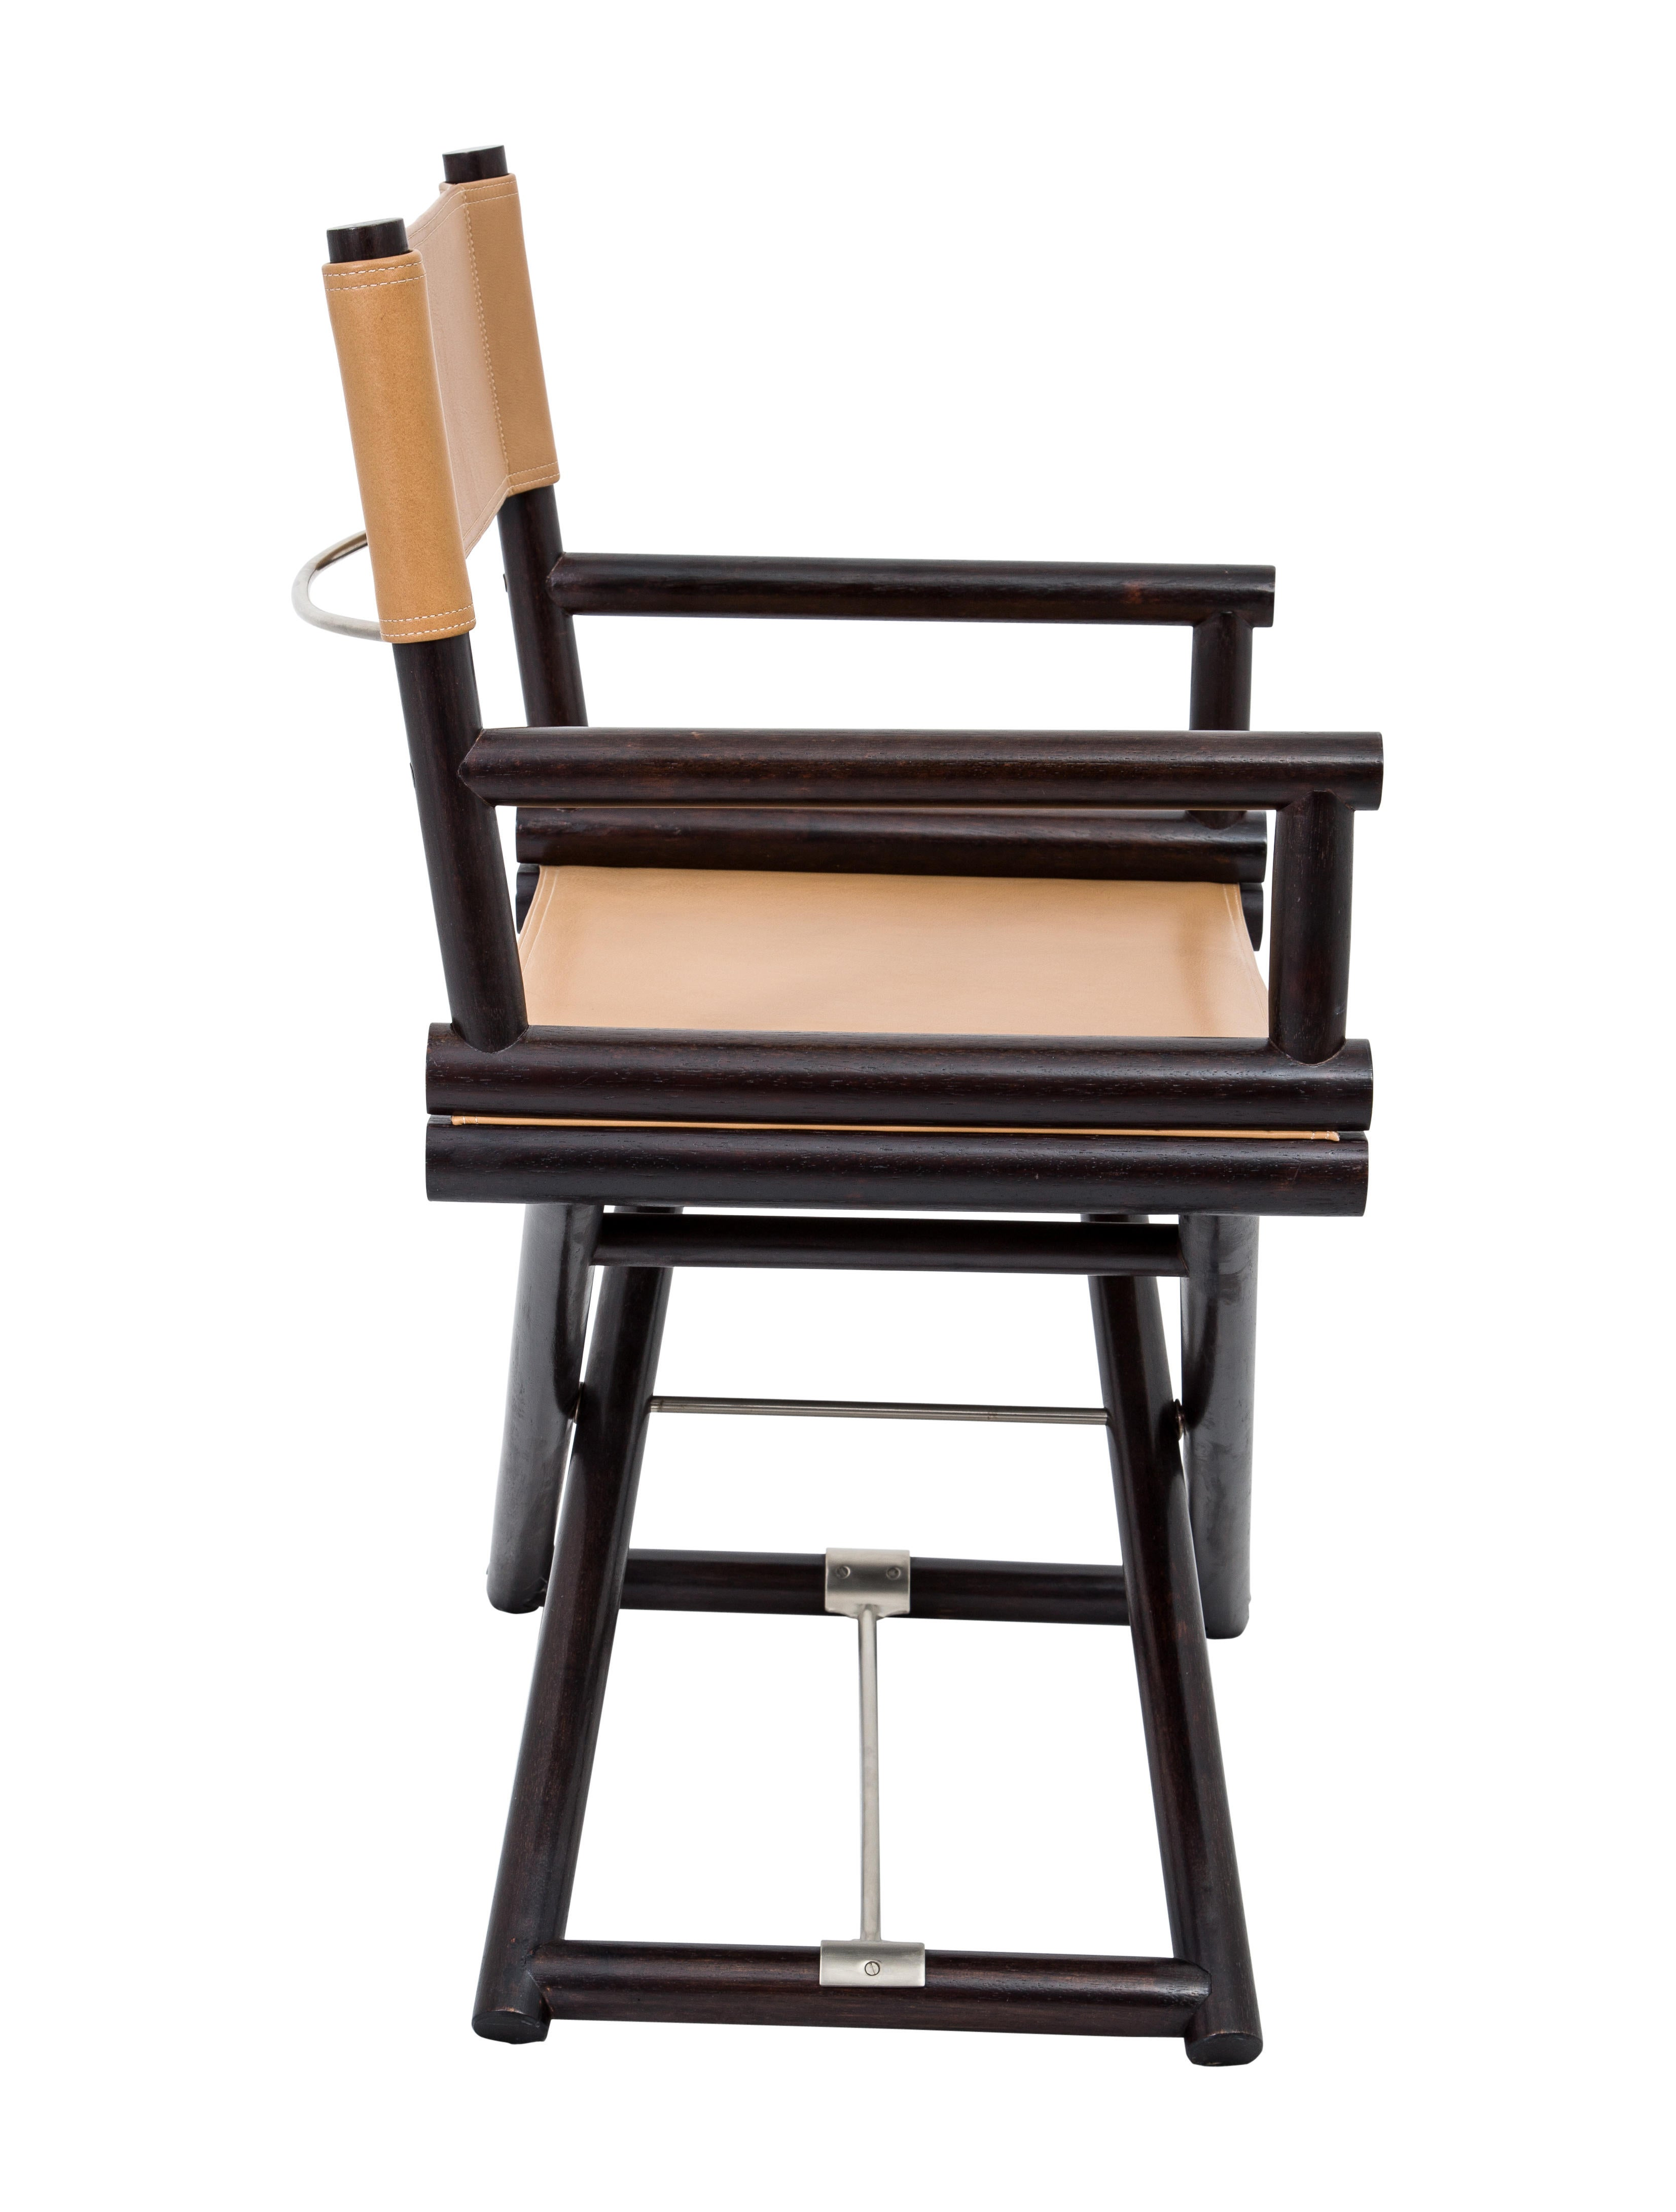 Leather Directoru0027s Chairs